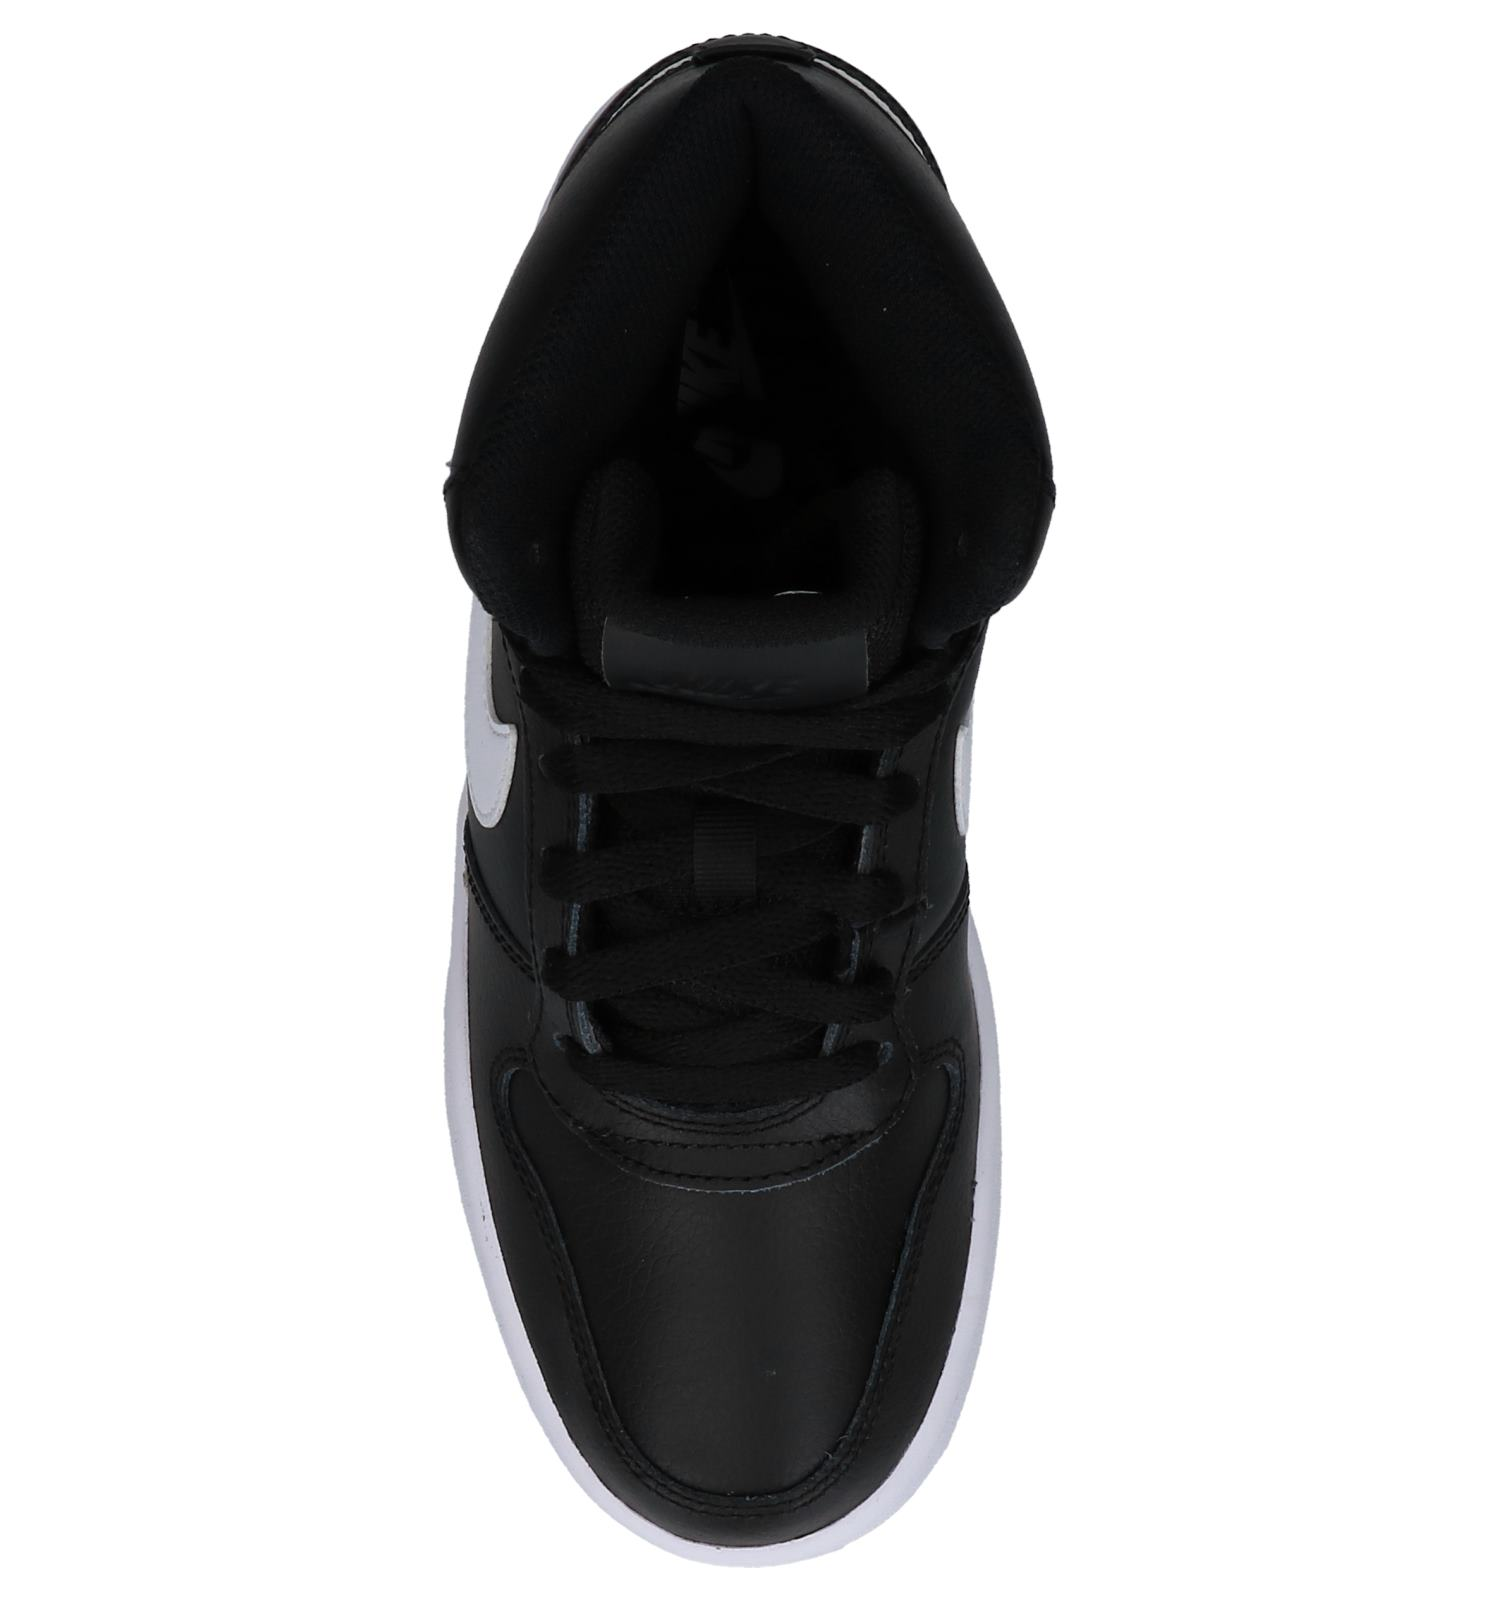 17931669c54 Zwarte Lederen Hoge Sneakers Nike Ebernon Mid | TORFS.BE | Gratis verzend  en retour